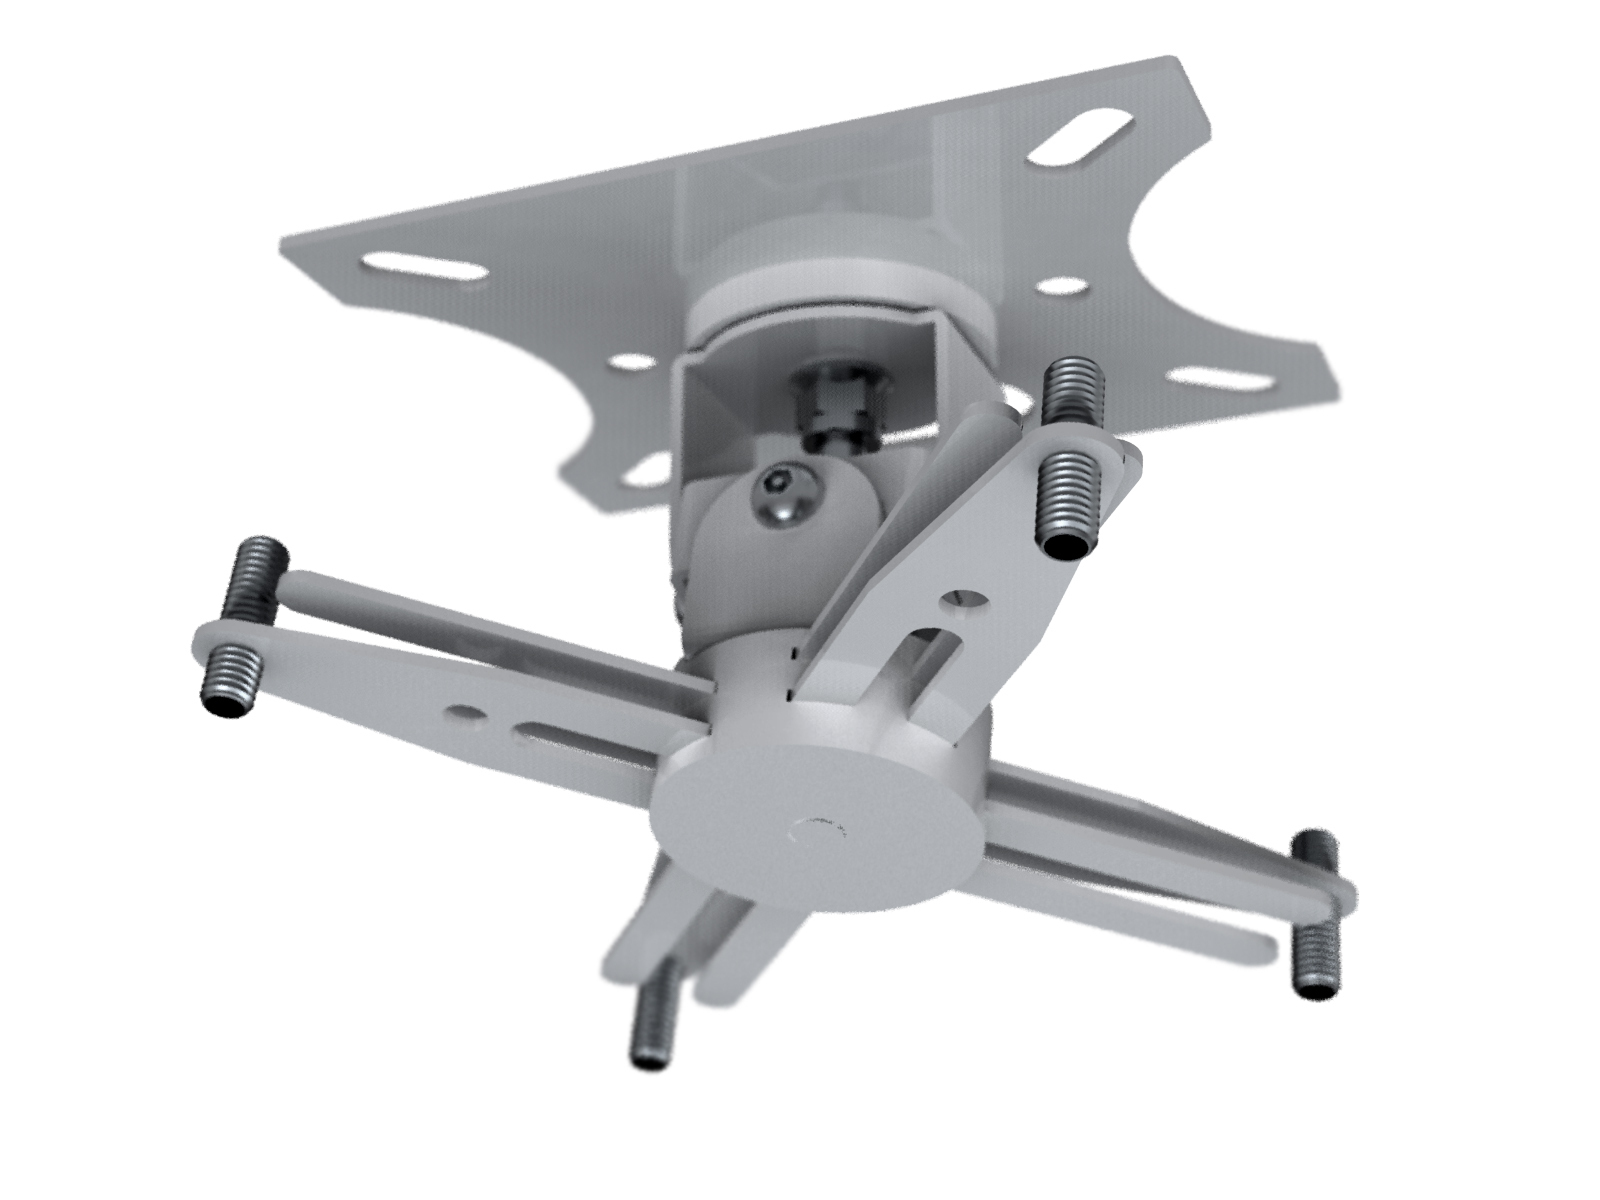 Vision TM-CC ceiling White project mount